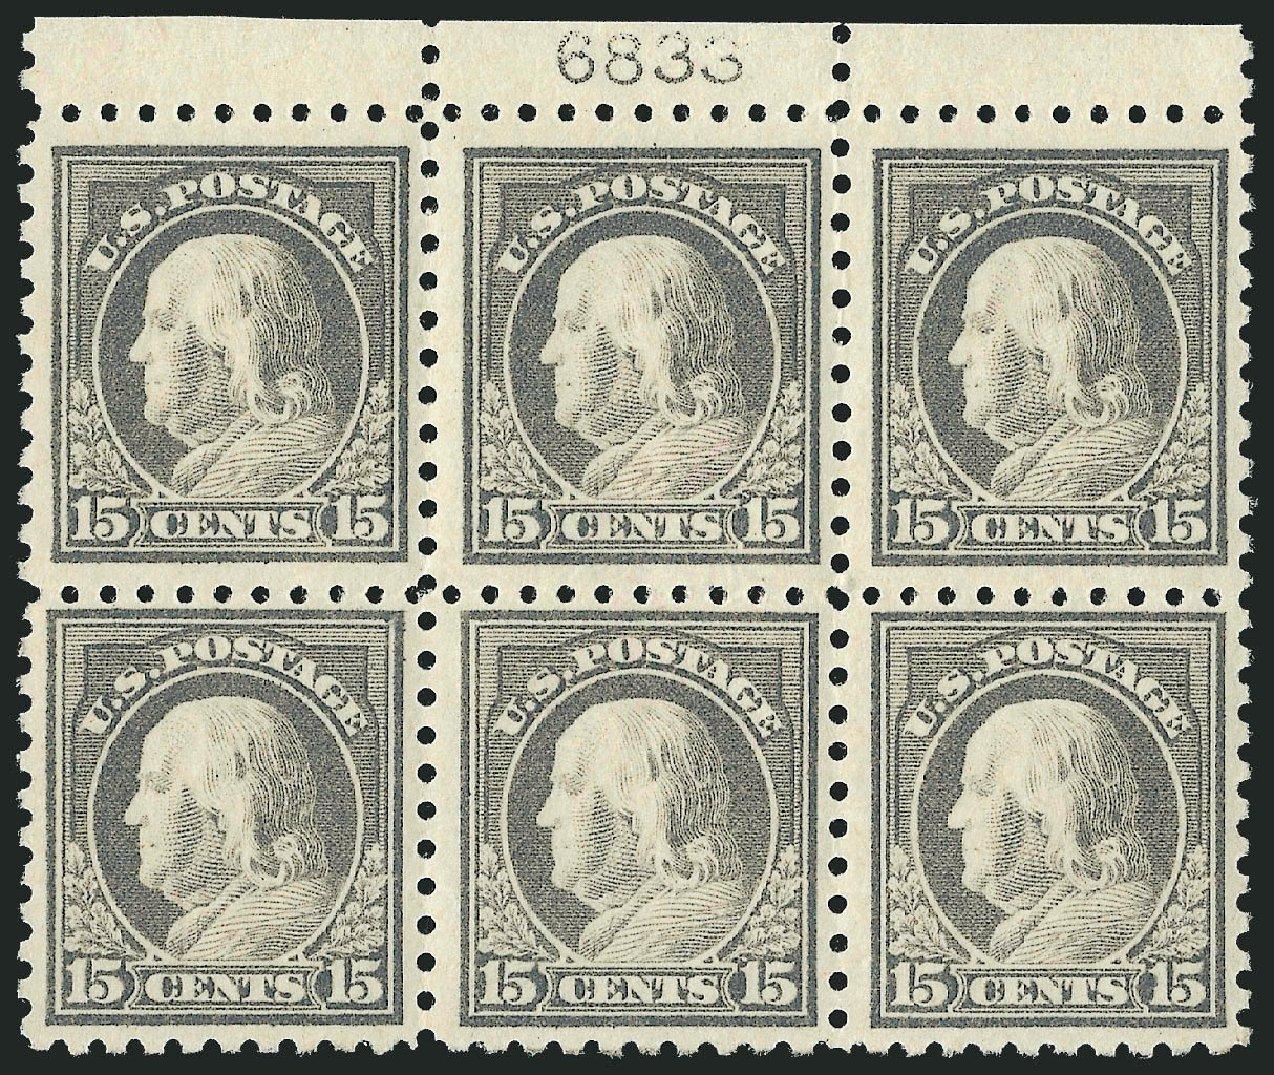 US Stamps Price Scott #475: 15c 1916 Franklin Perf 10. Robert Siegel Auction Galleries, Jul 2014, Sale 1077, Lot 290